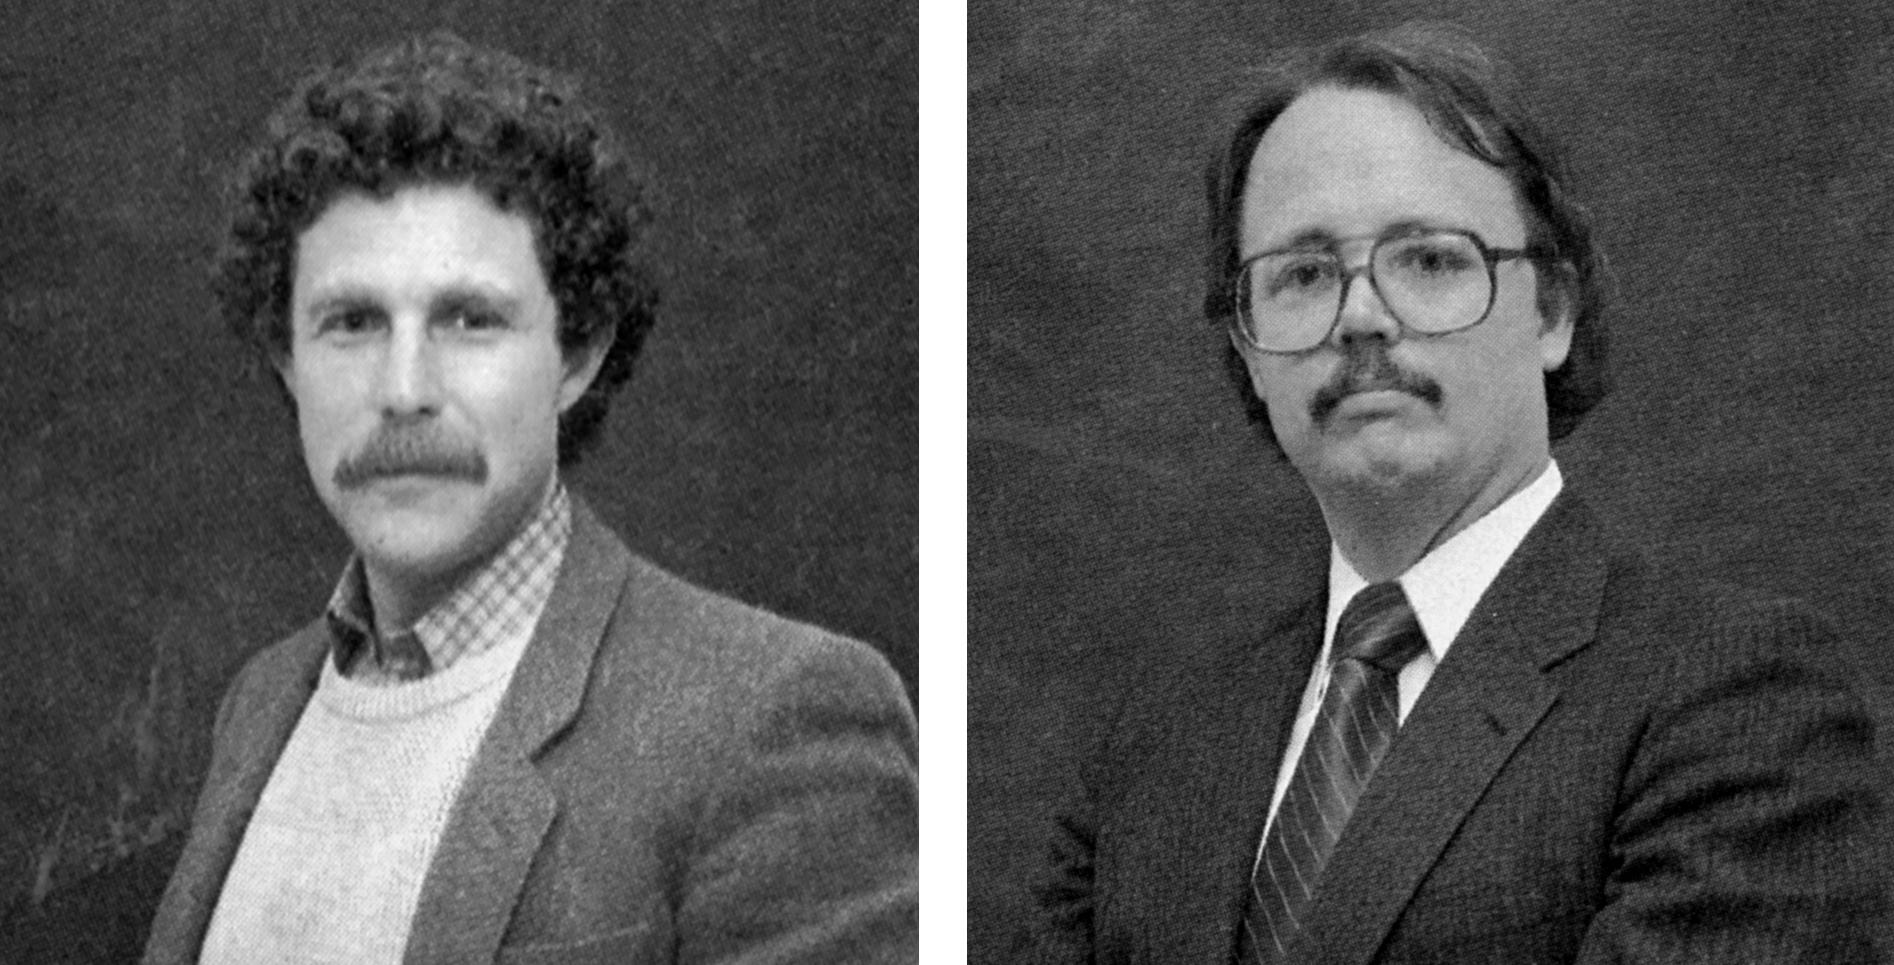 Andrew Fluegelman and David Bunnell